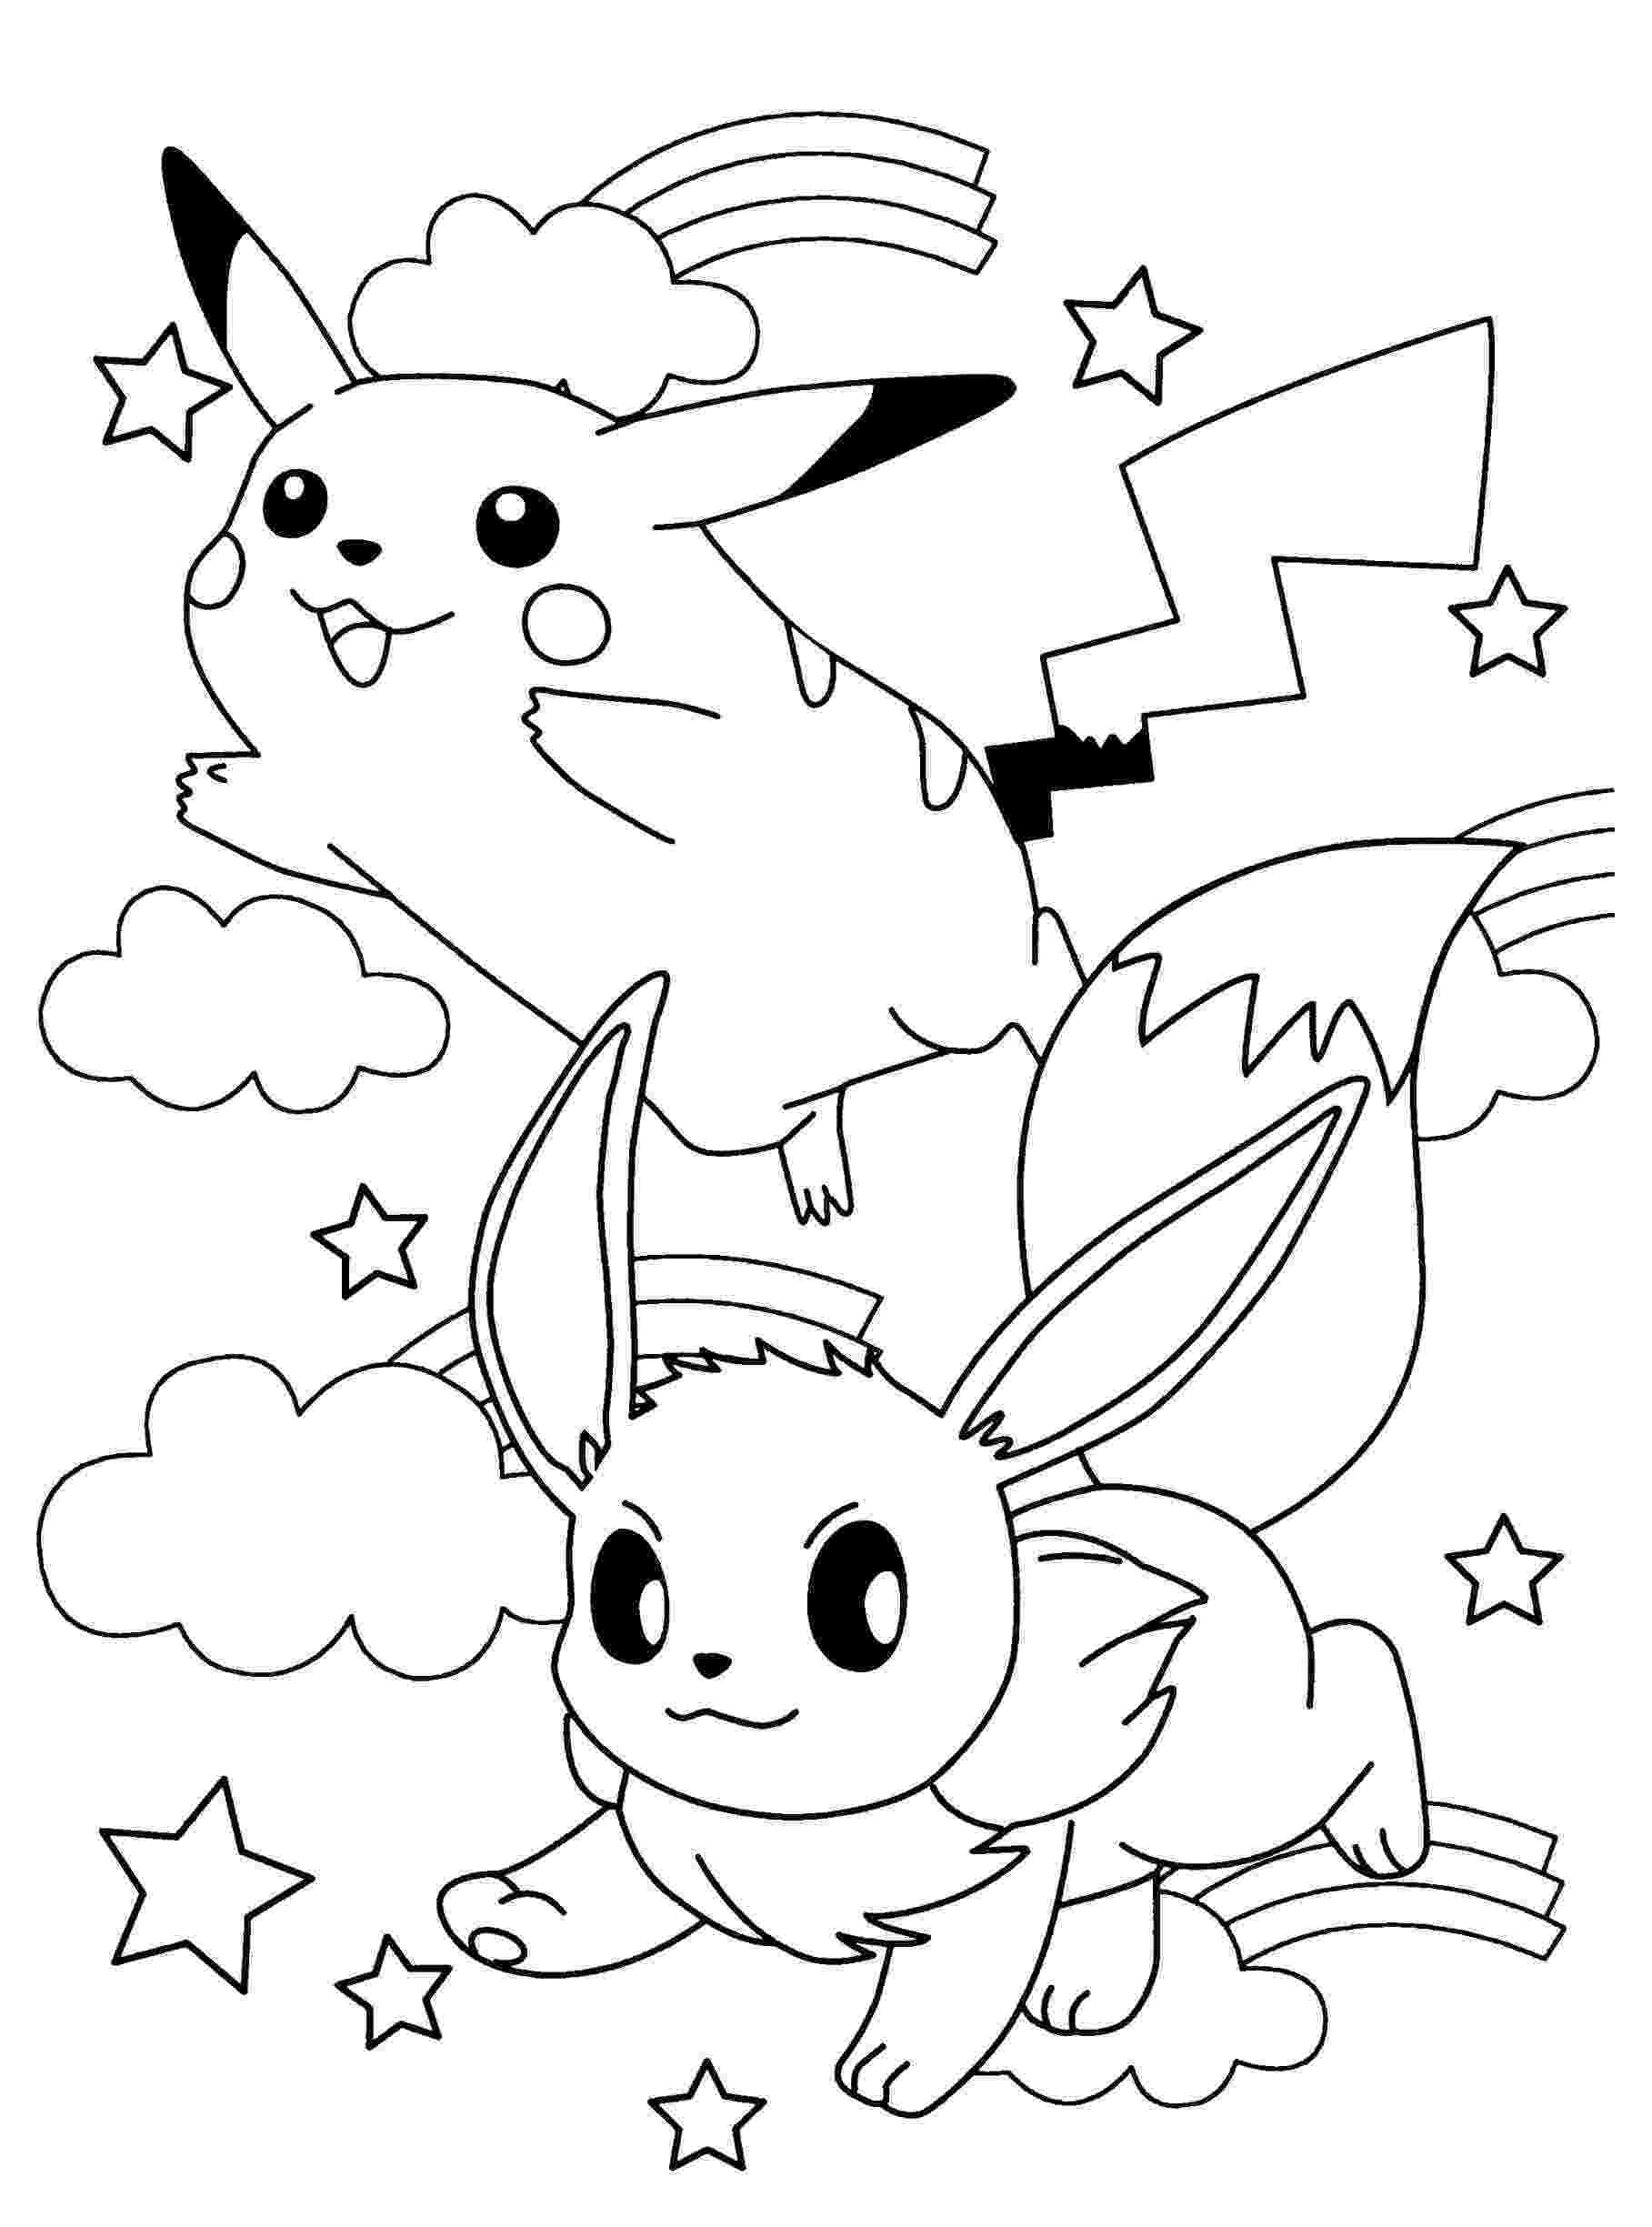 eevee coloring pages gudu ngiseng blog pokemon coloring pages umbreon coloring pages eevee